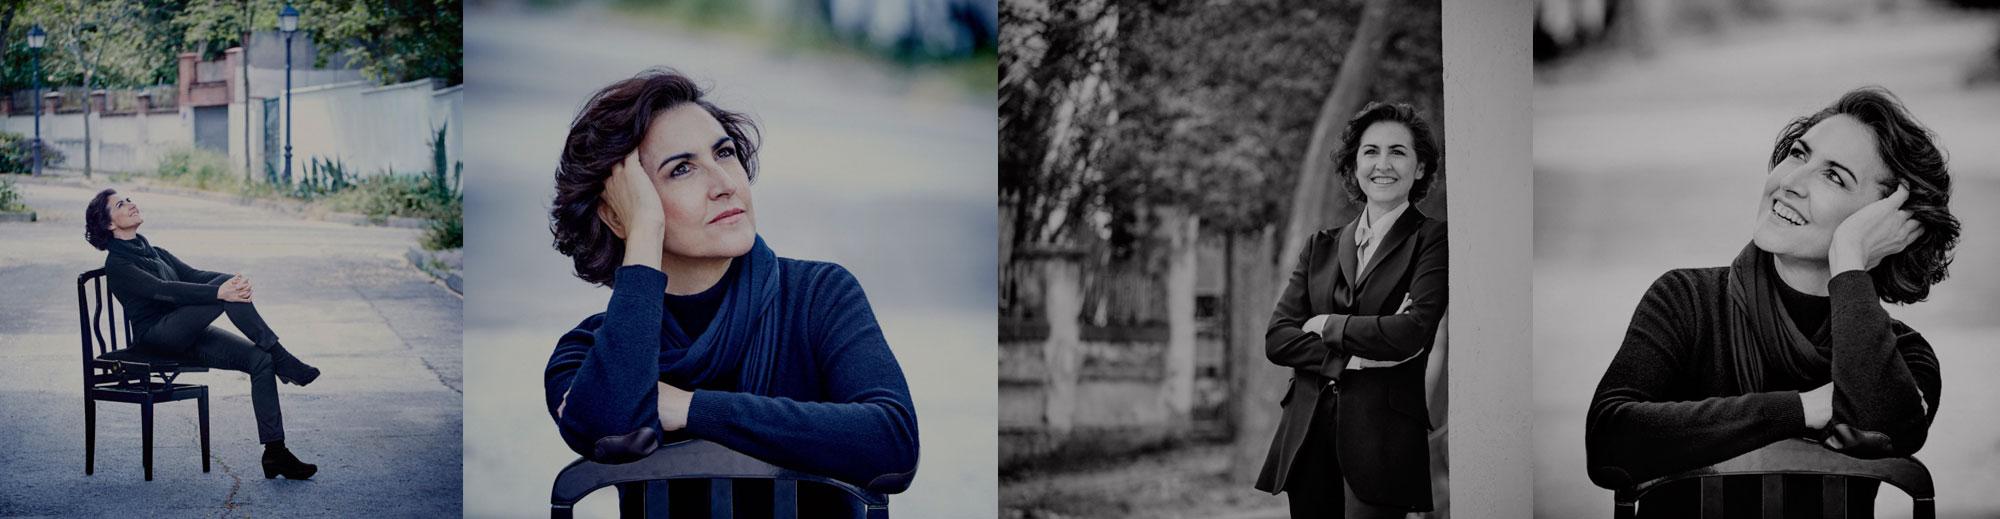 Rosa Torres-Pardo, Premio Nacional de Música 2017